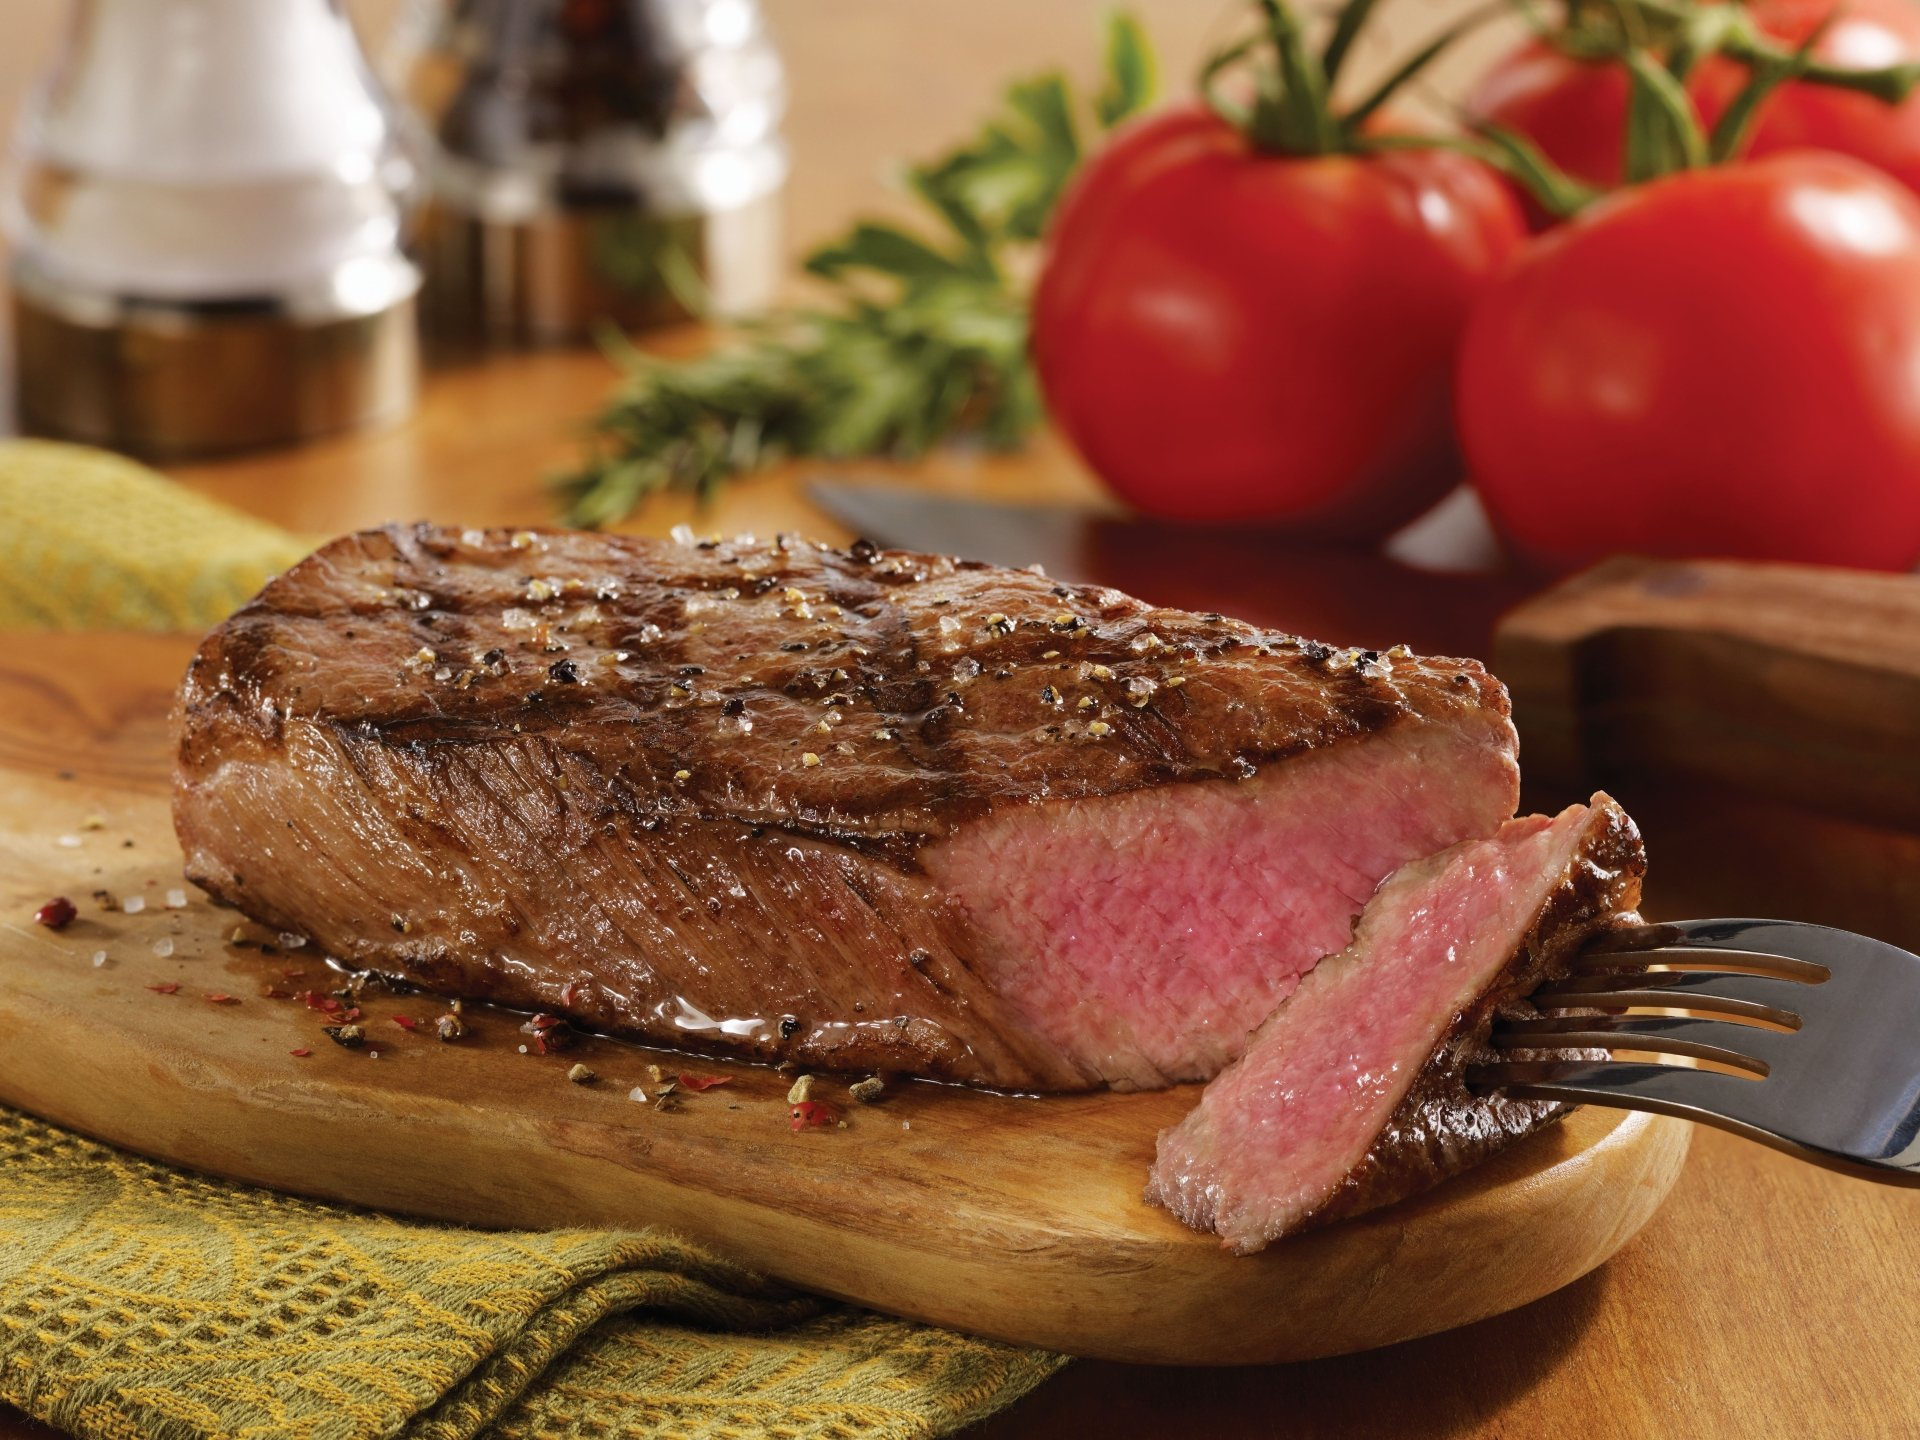 Food - Meat  Wallpaper